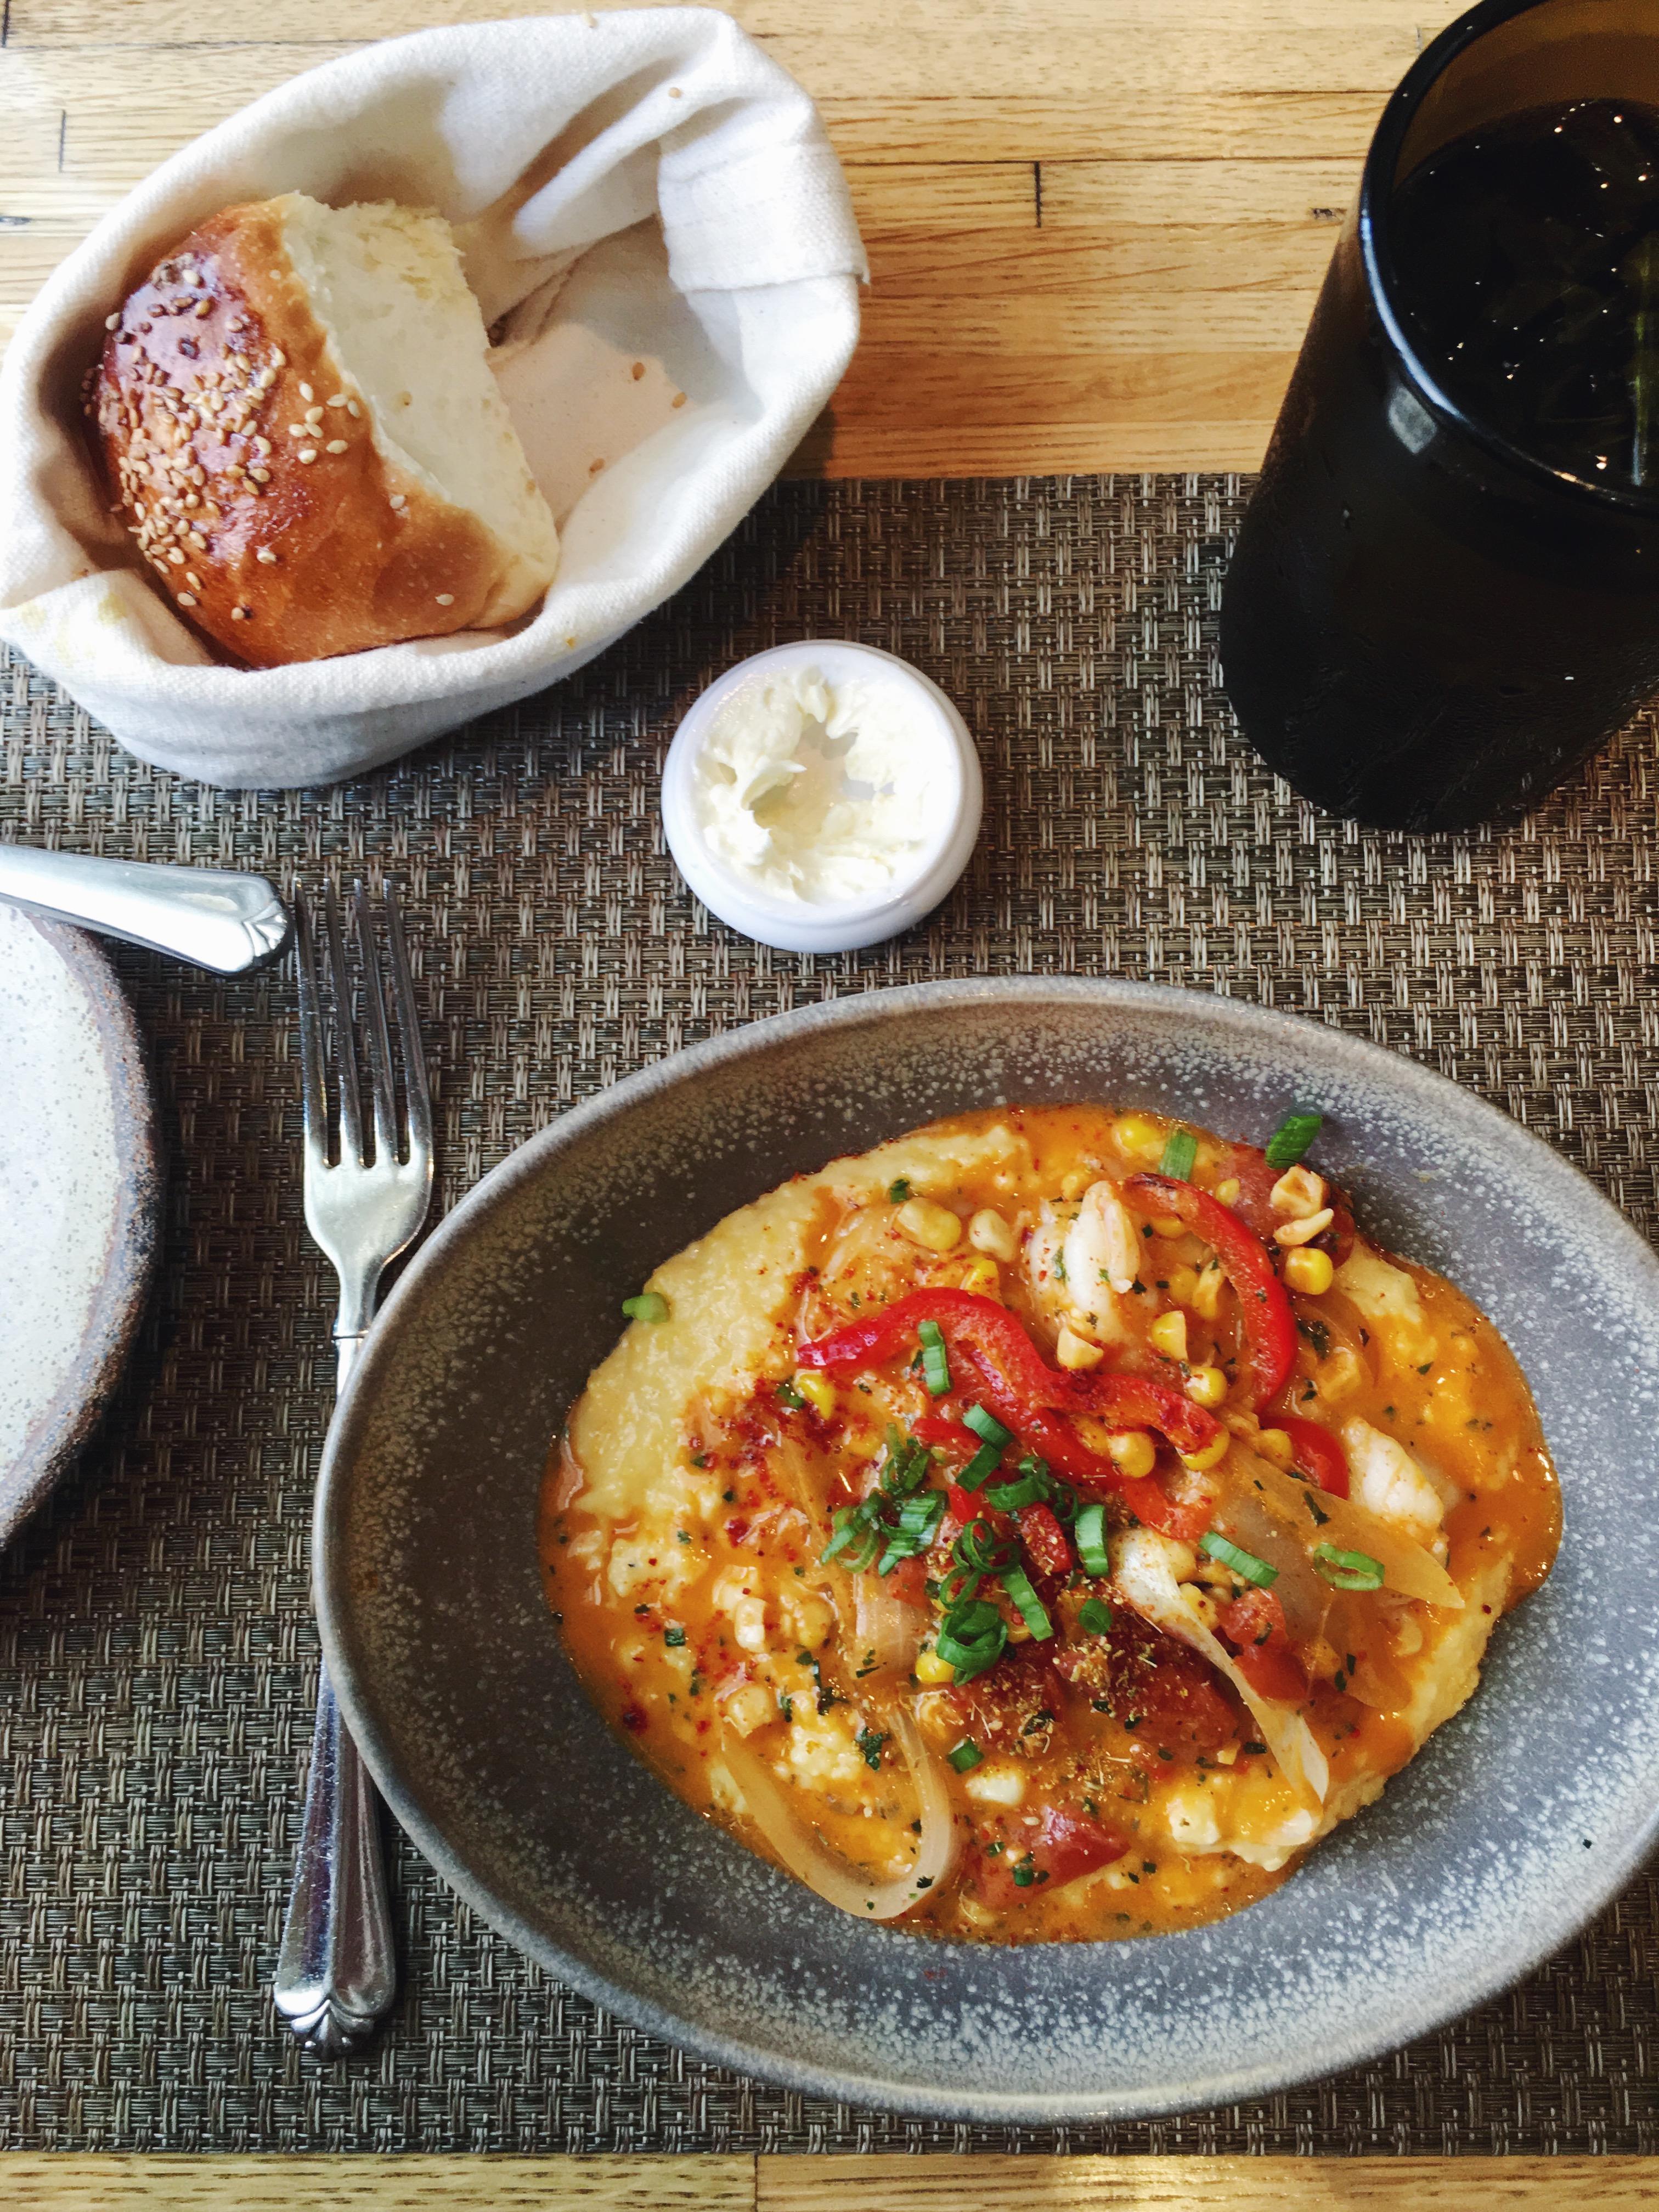 charleston food scene: lunch at husk restaurant